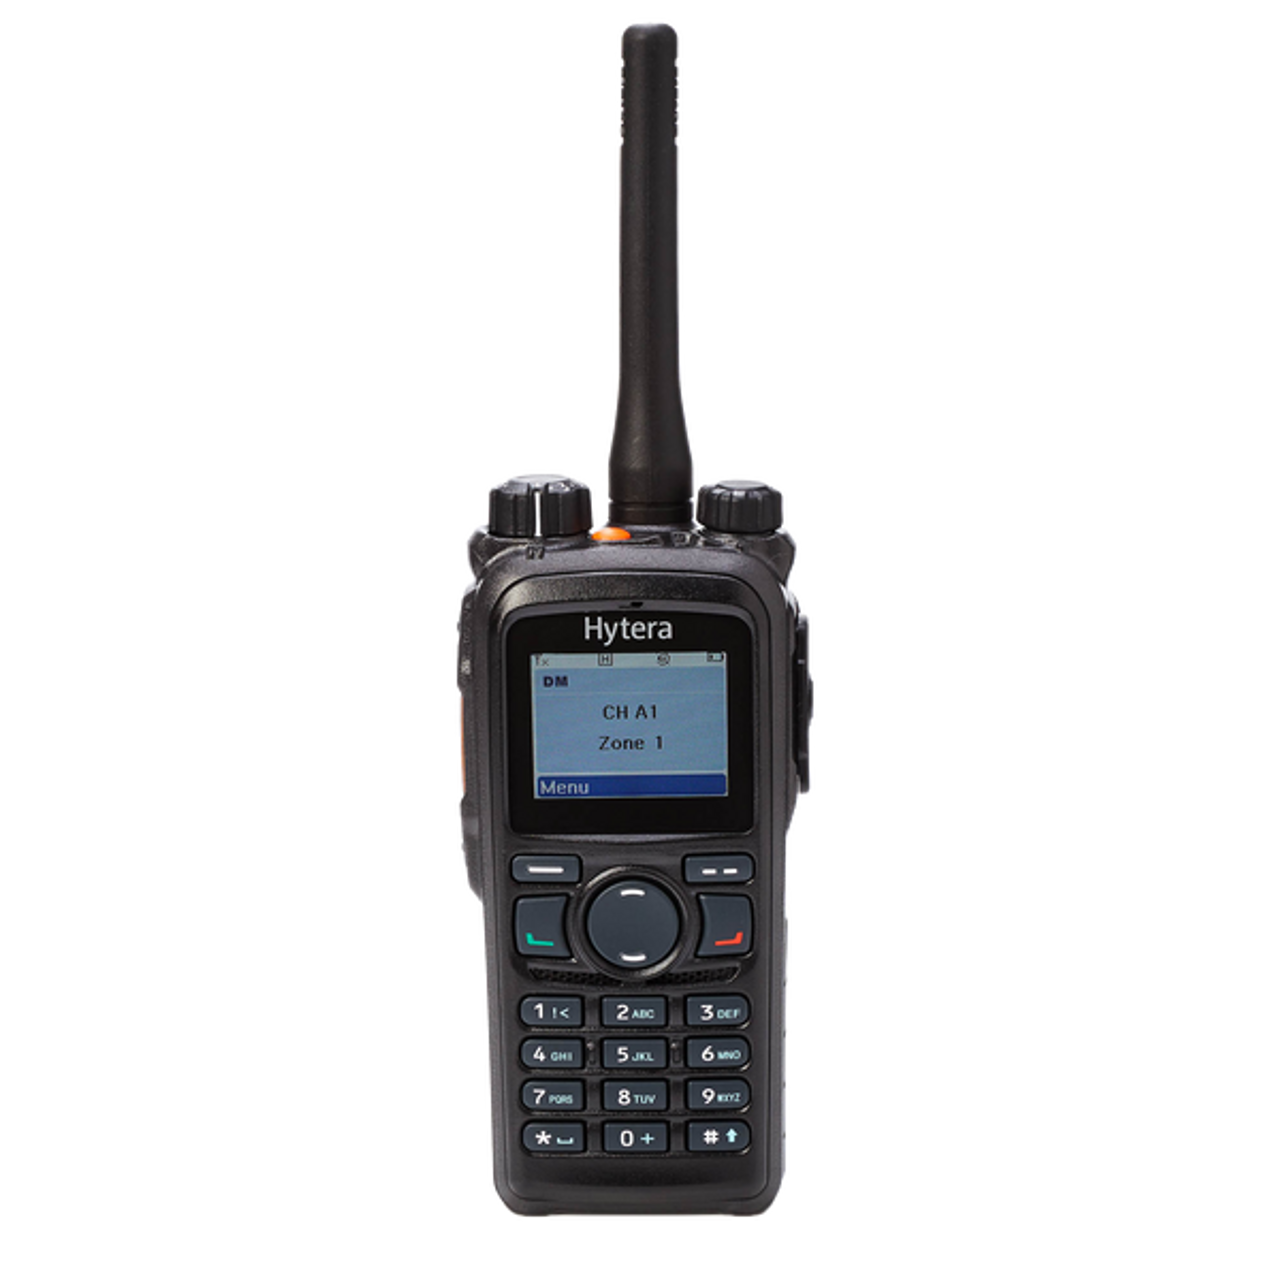 Hytera PD782i UL913 Digital Two Way Radio